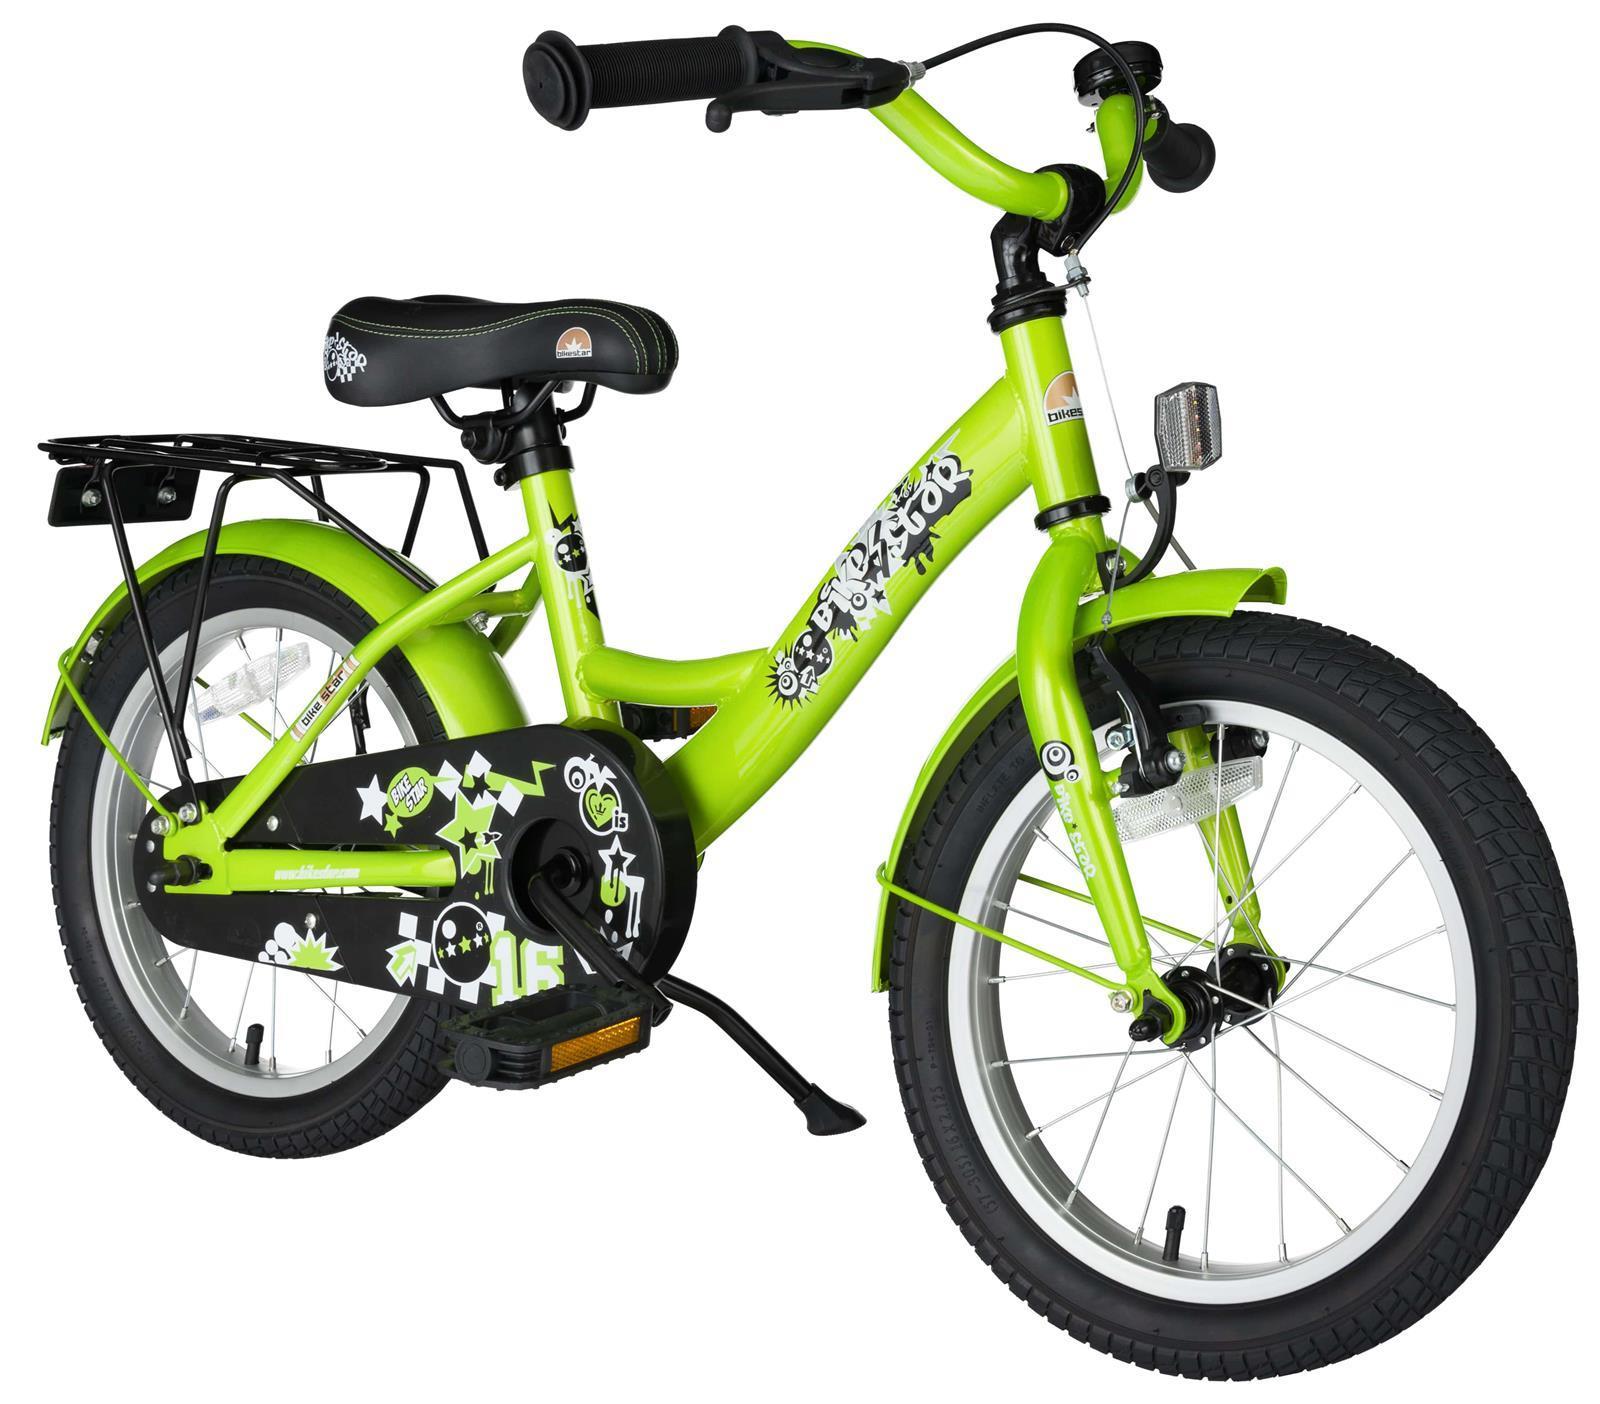 bi 16 kk 02 gree bikestar 16 zoll fahrrad gruen. Black Bedroom Furniture Sets. Home Design Ideas